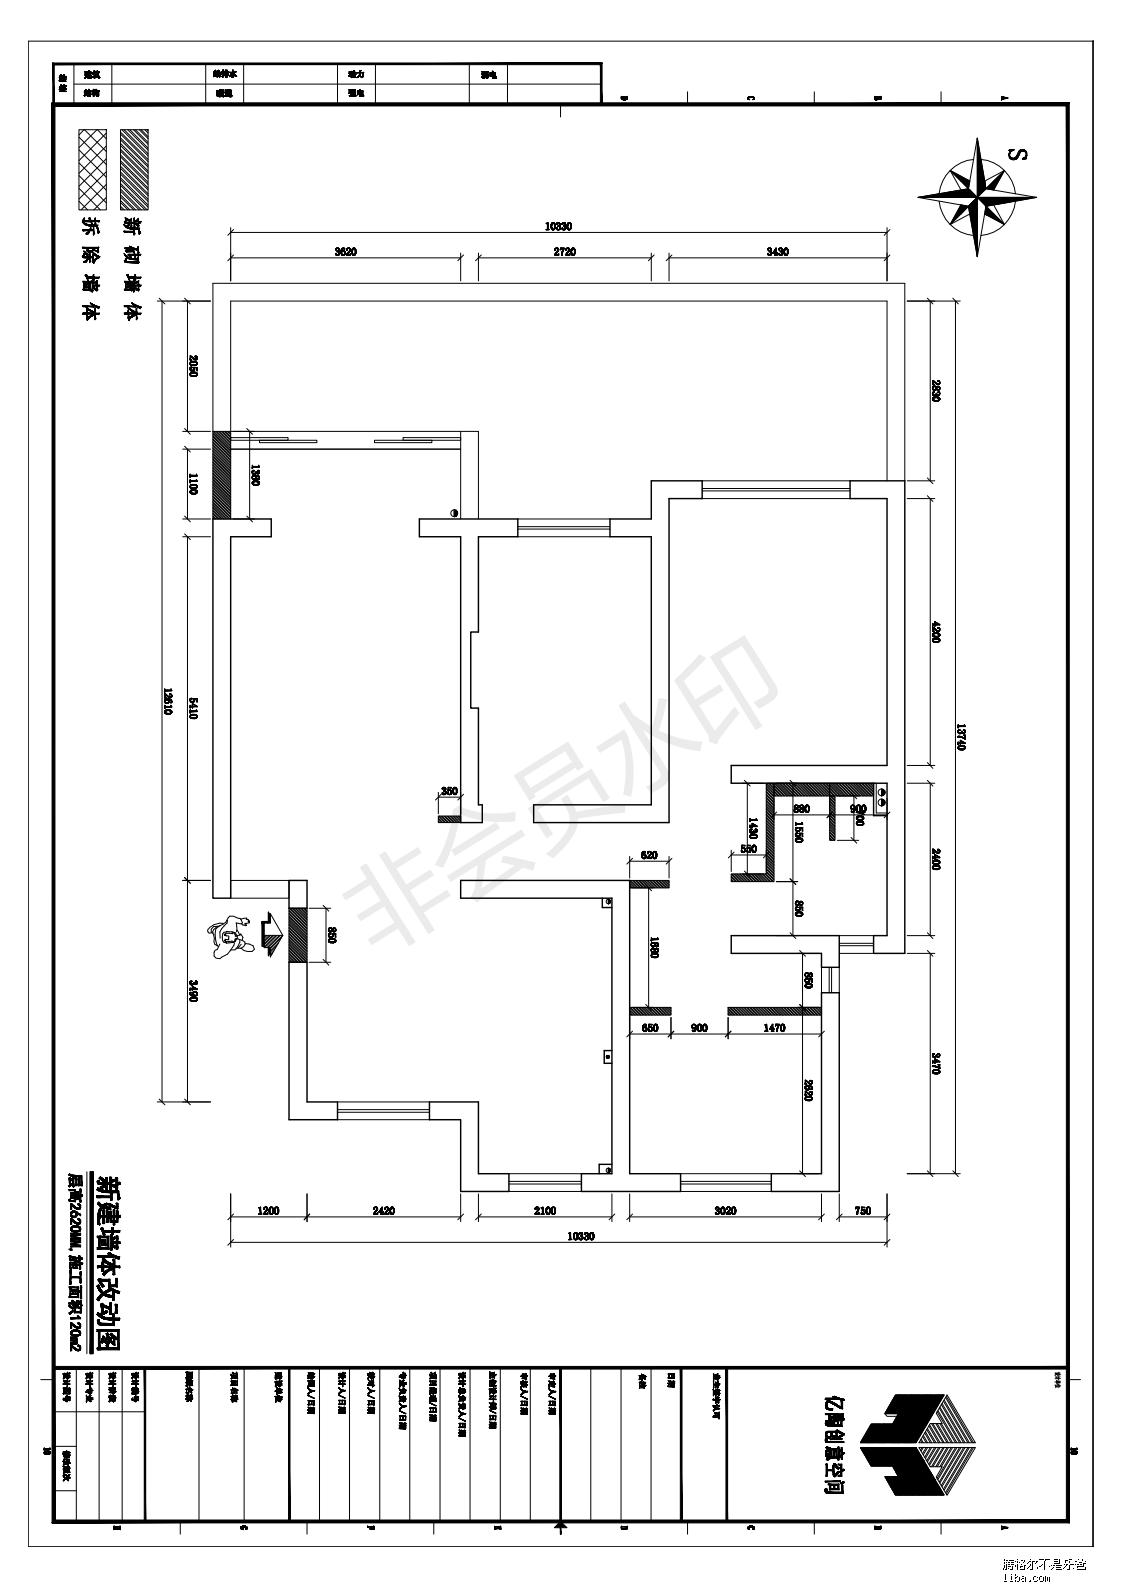 新建墙体改动图(1)_00.png